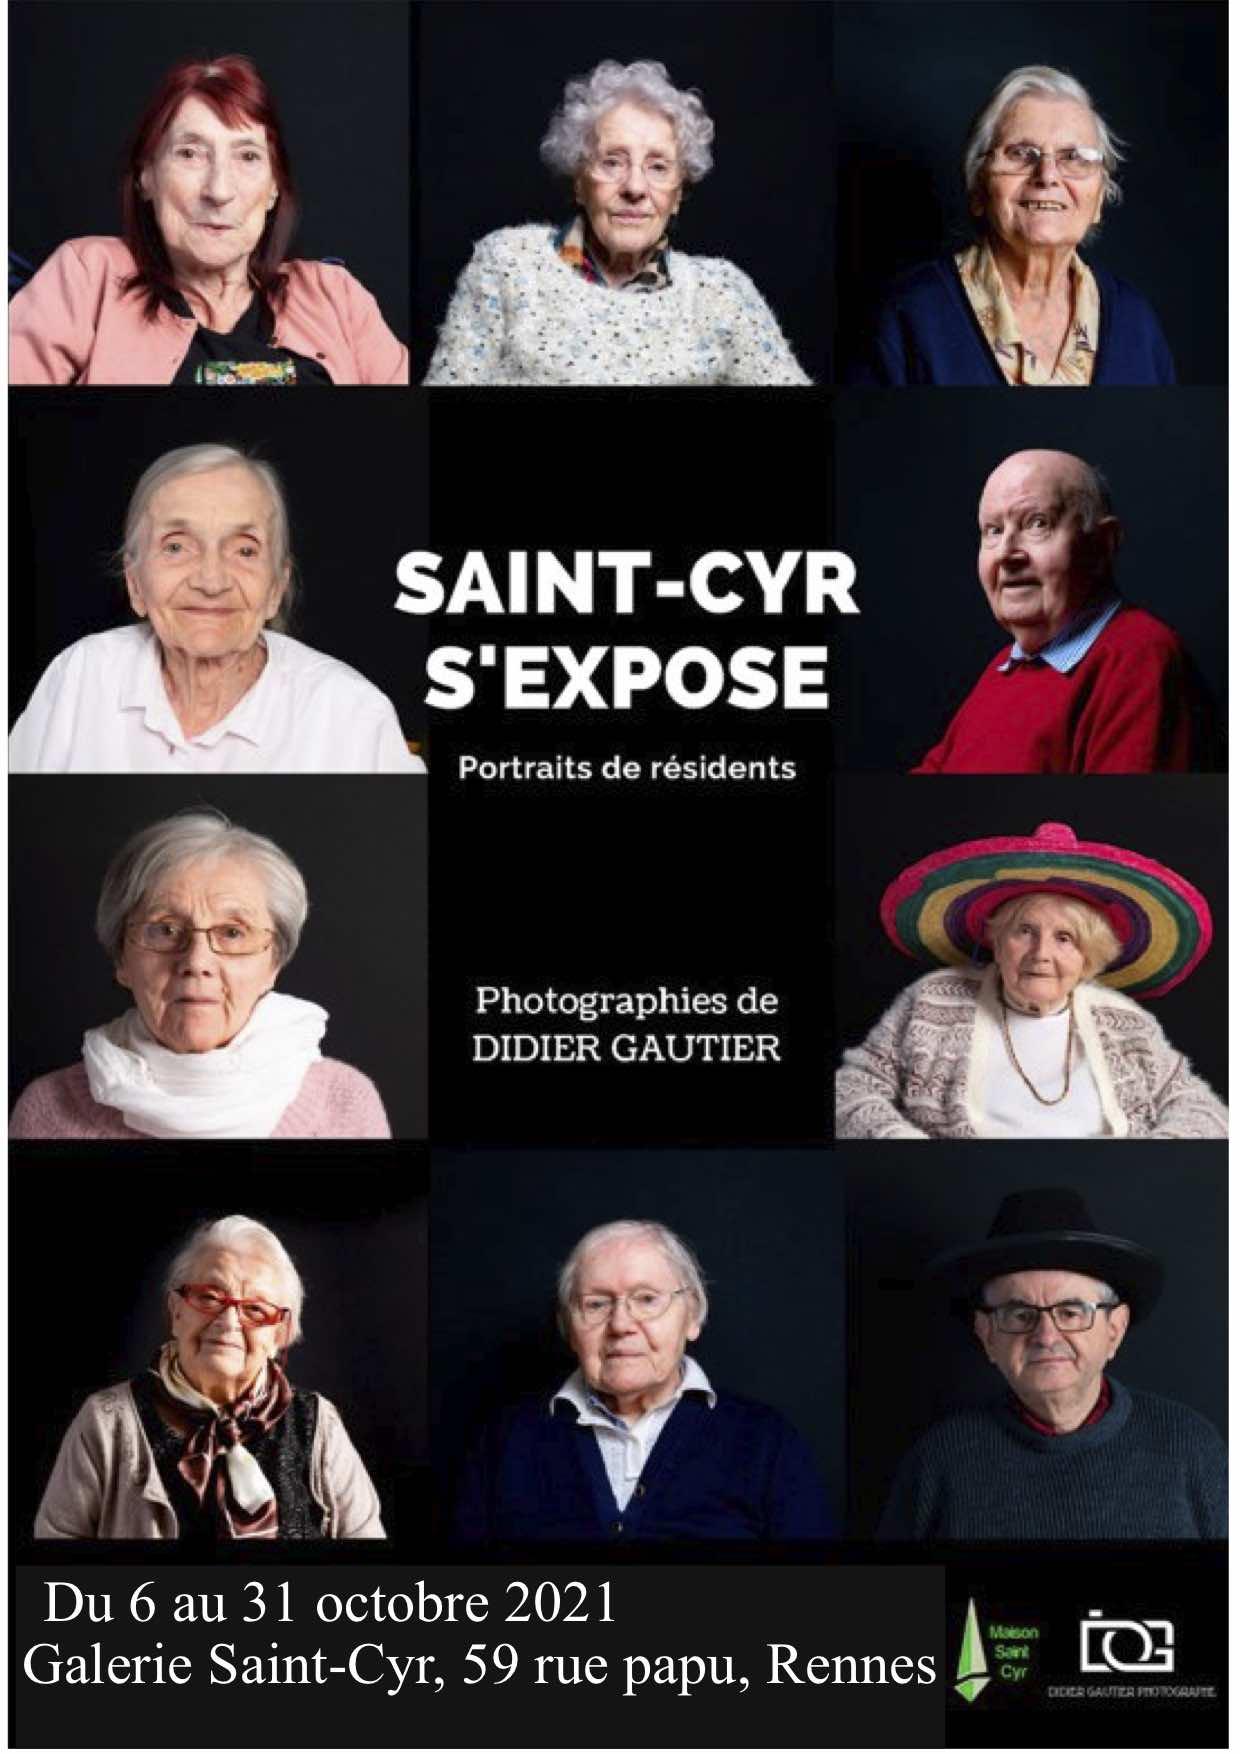 Saint Cyr s'expose